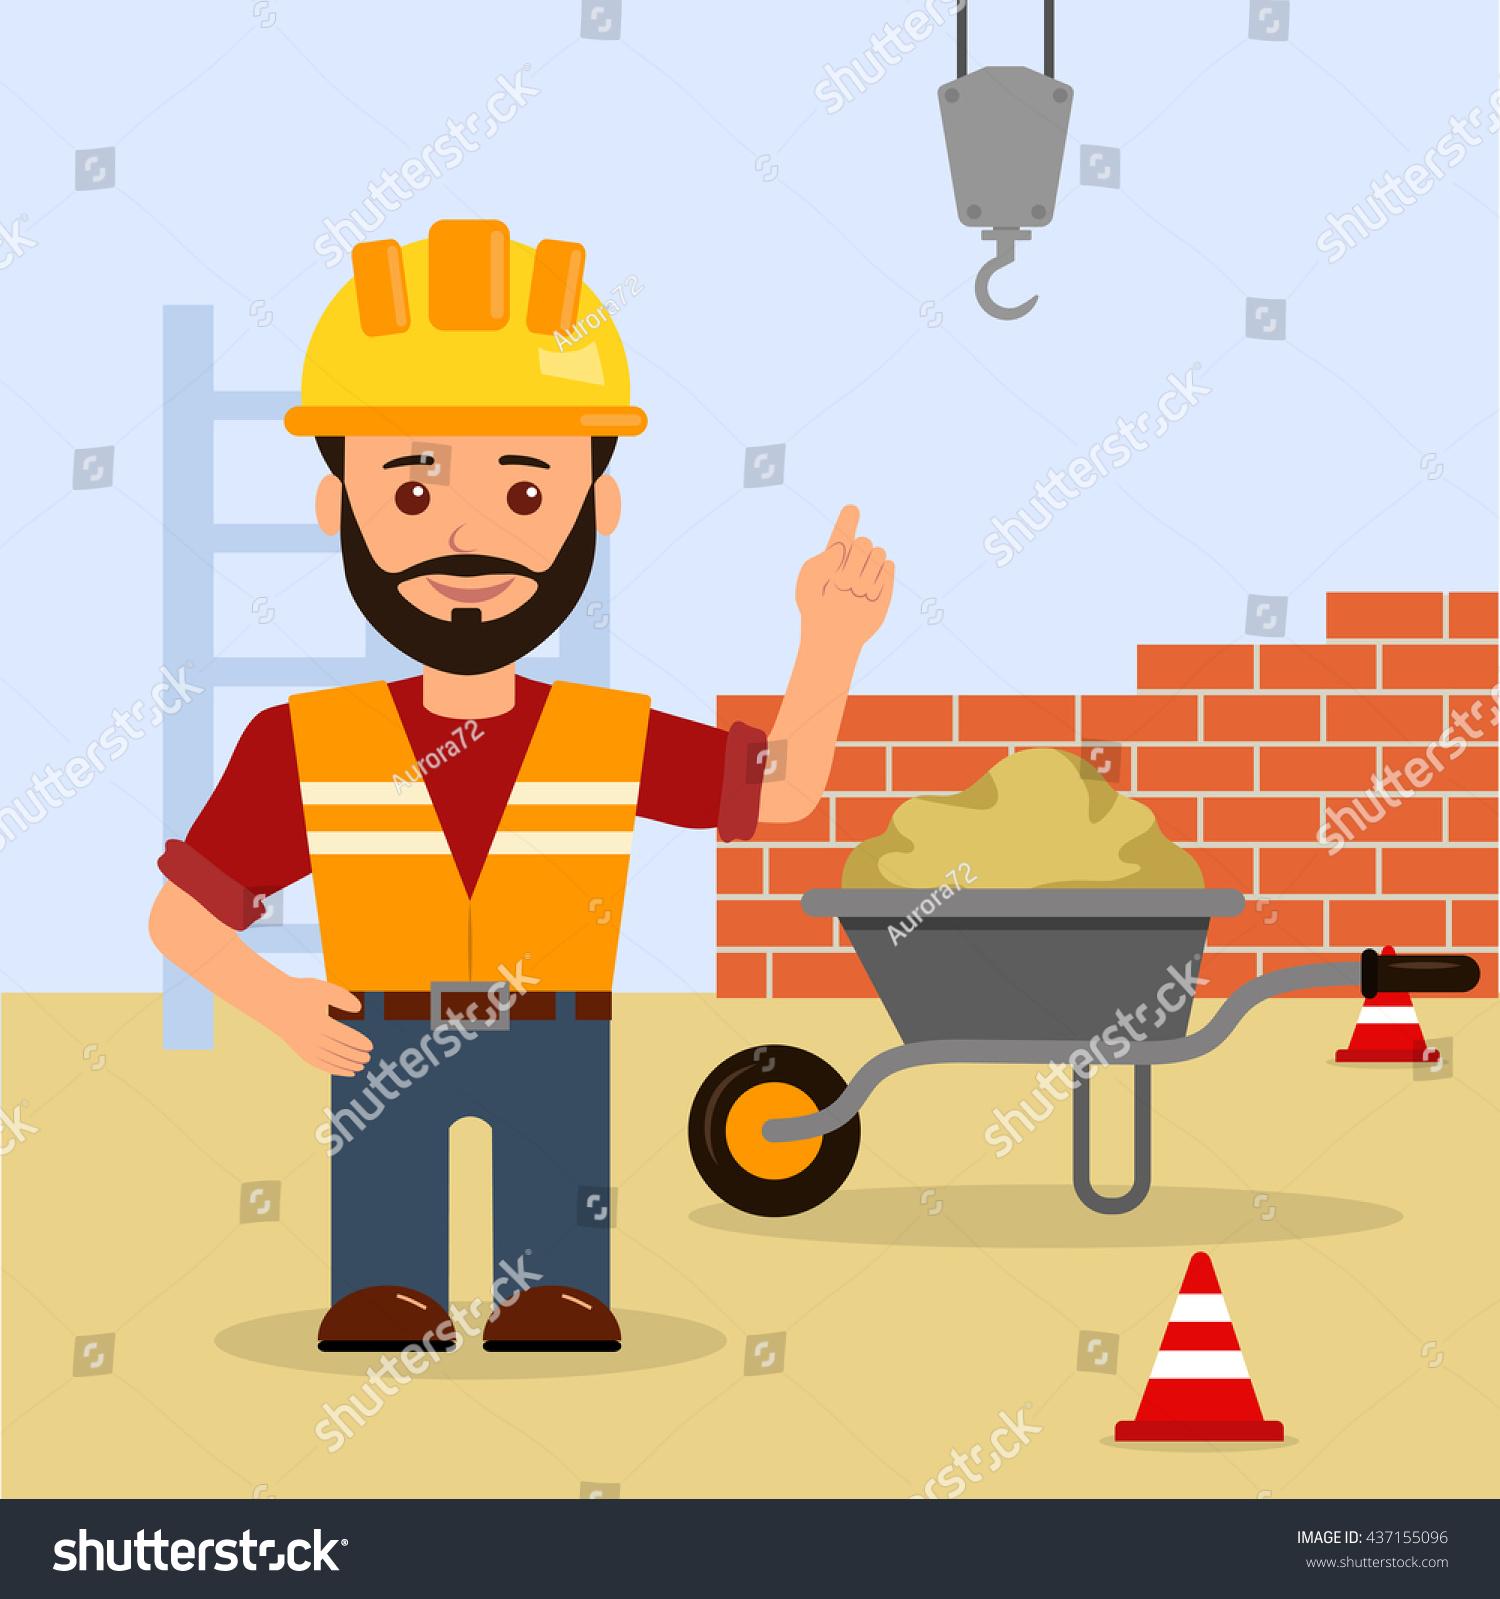 Building Construction Cartoon : Man foreman construction site building stock